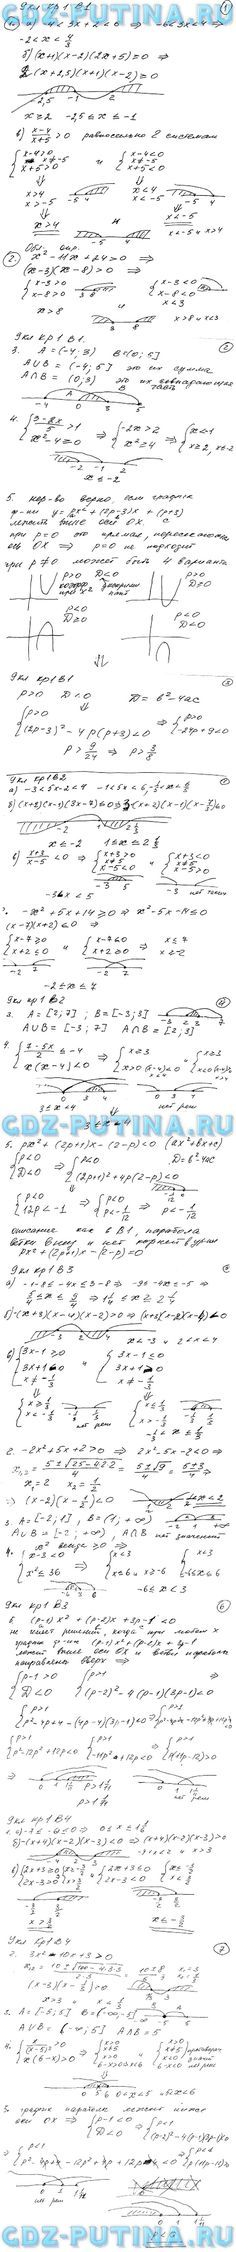 Godoza.ru общая биология 10 класс